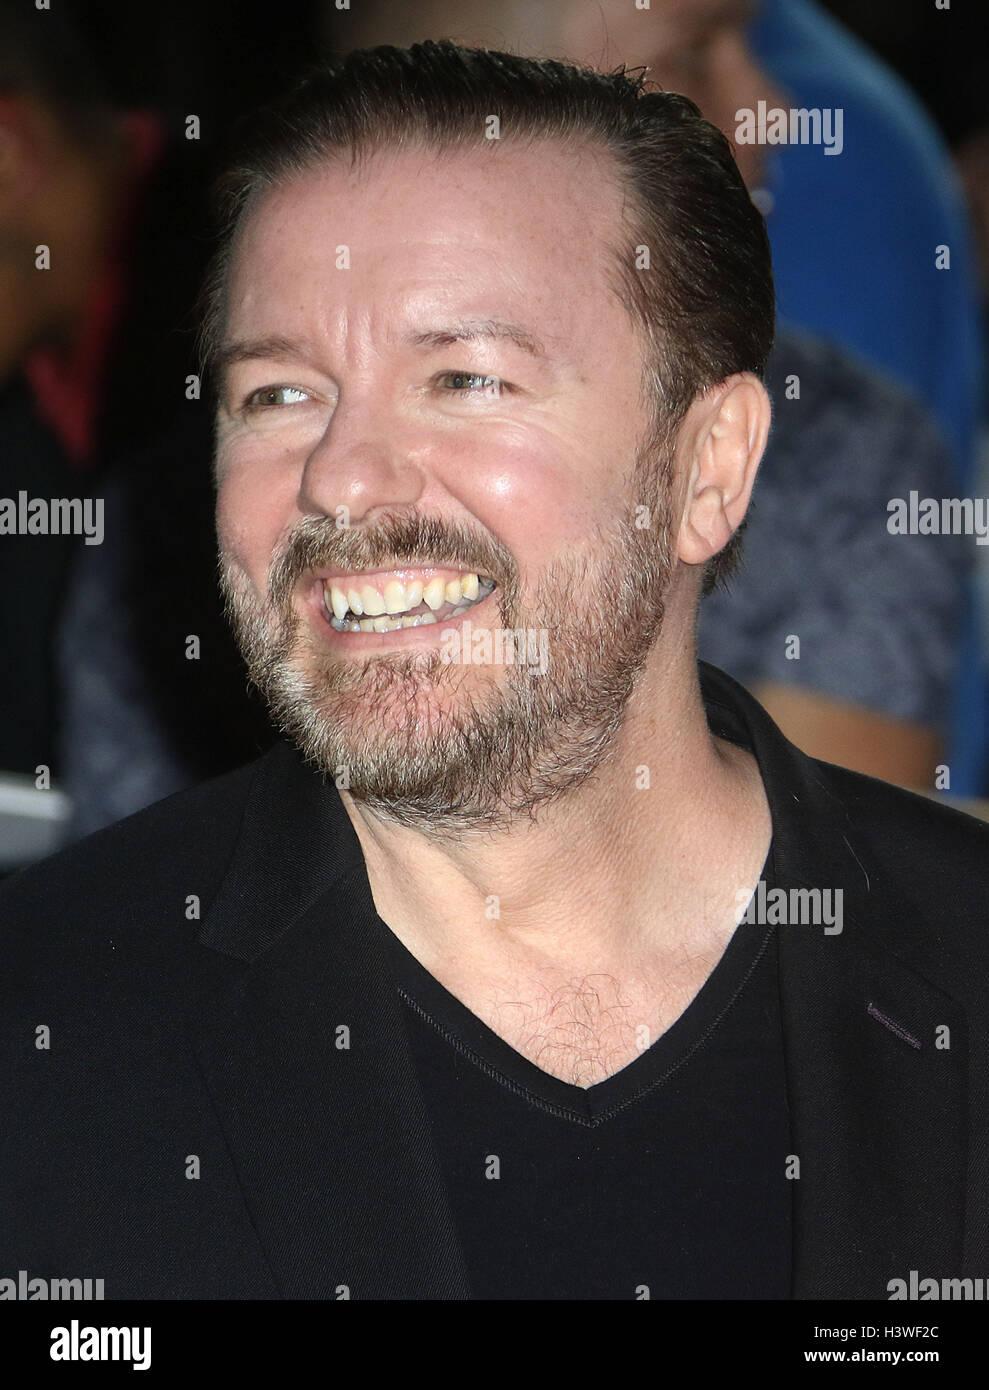 6136ef4e84 September 6, 2016 - Ricky Gervais attending GQ Men Of The Year Awards 2016  at Tate Modern in London, UK.